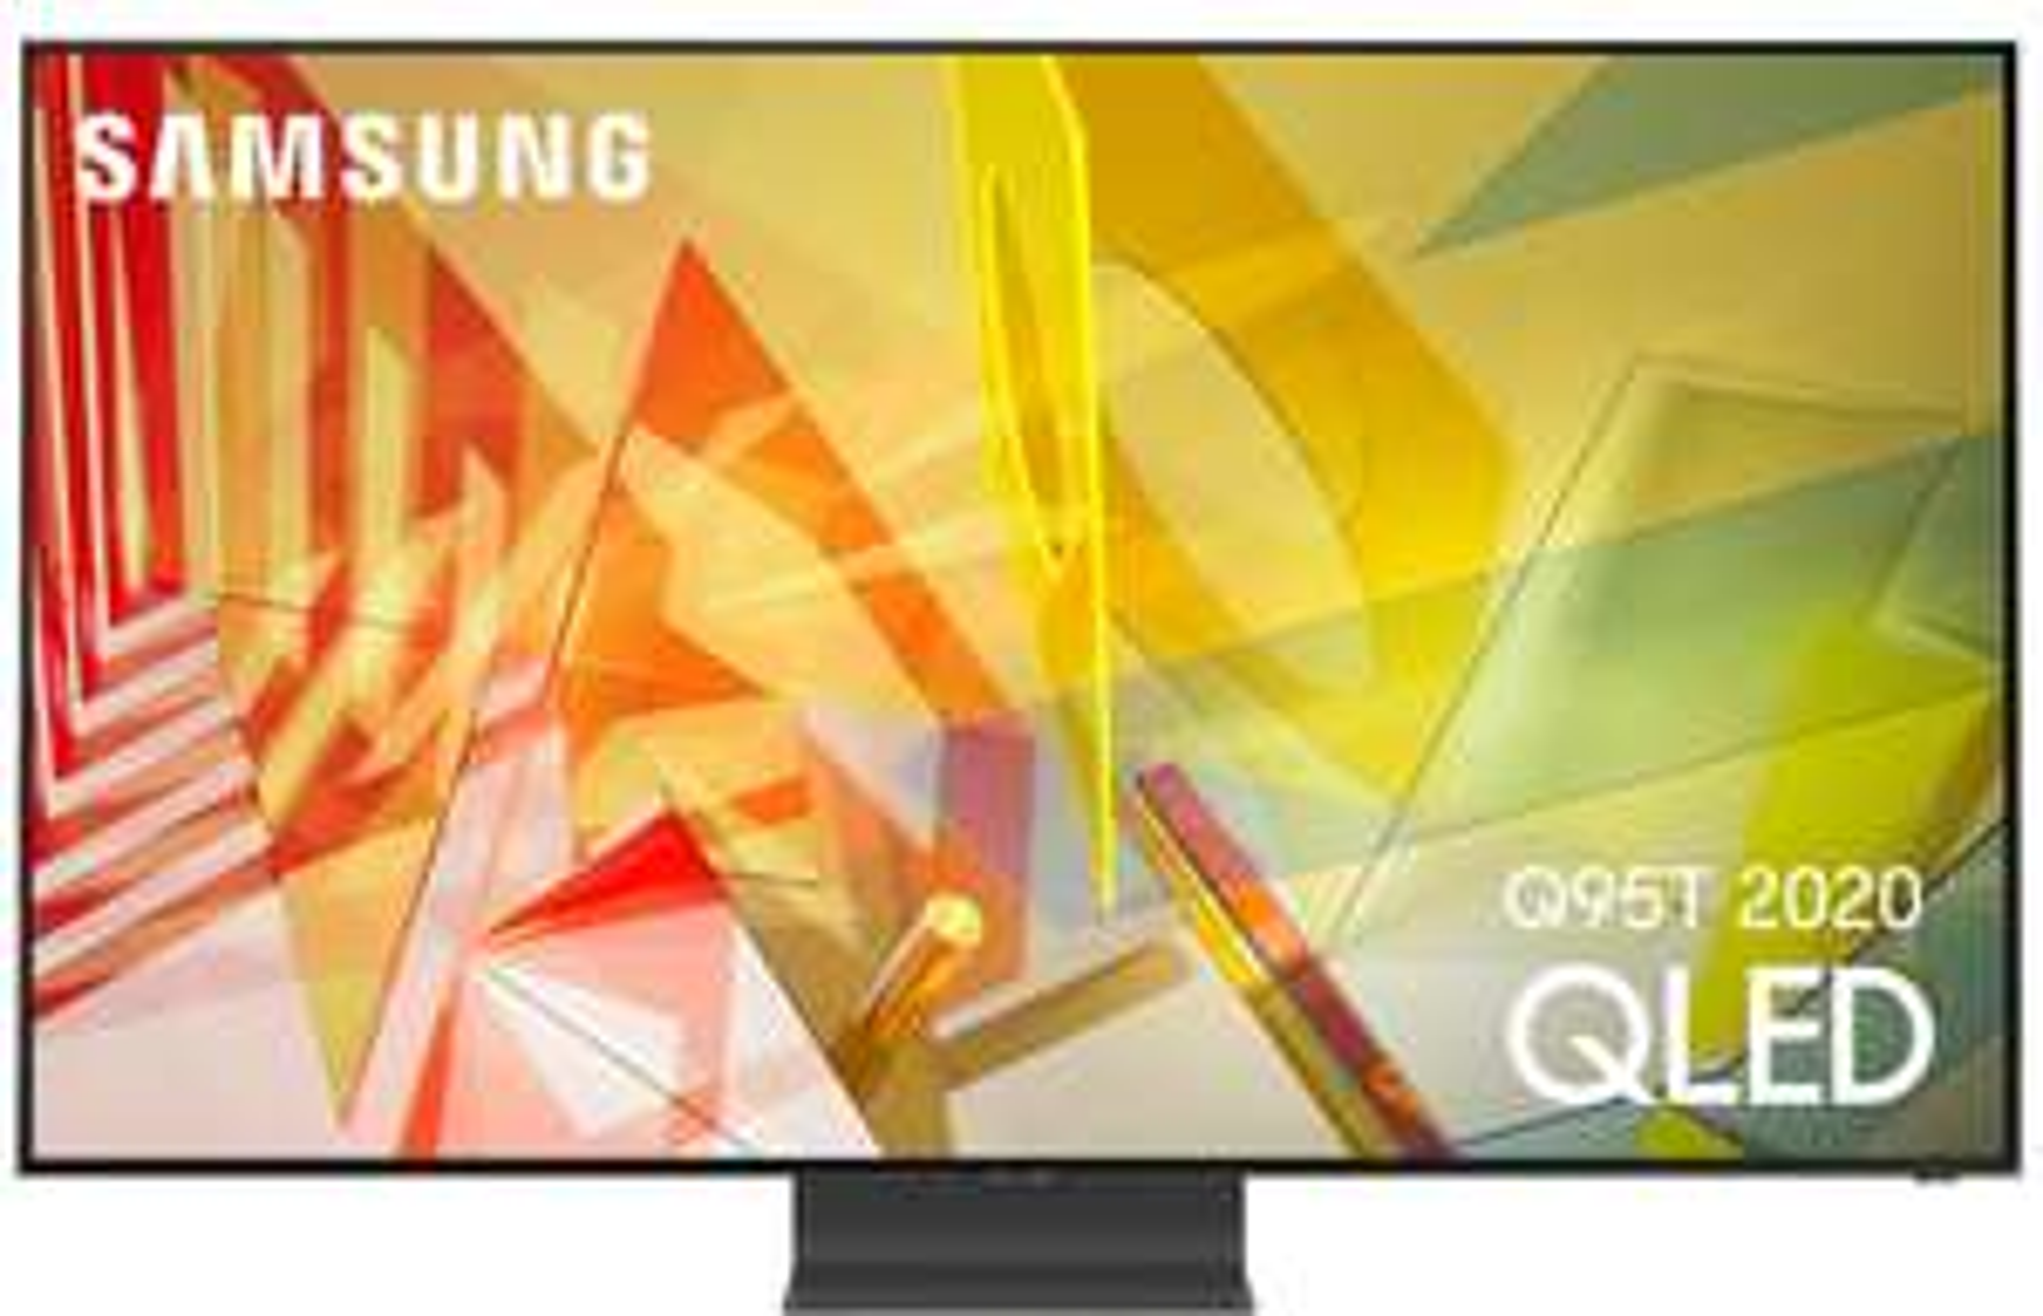 "TV QLED 55"" Samsung QE55Q95TC (2020) - 4K UHD, Smart TV, HDR, 100Hz + Support mural"